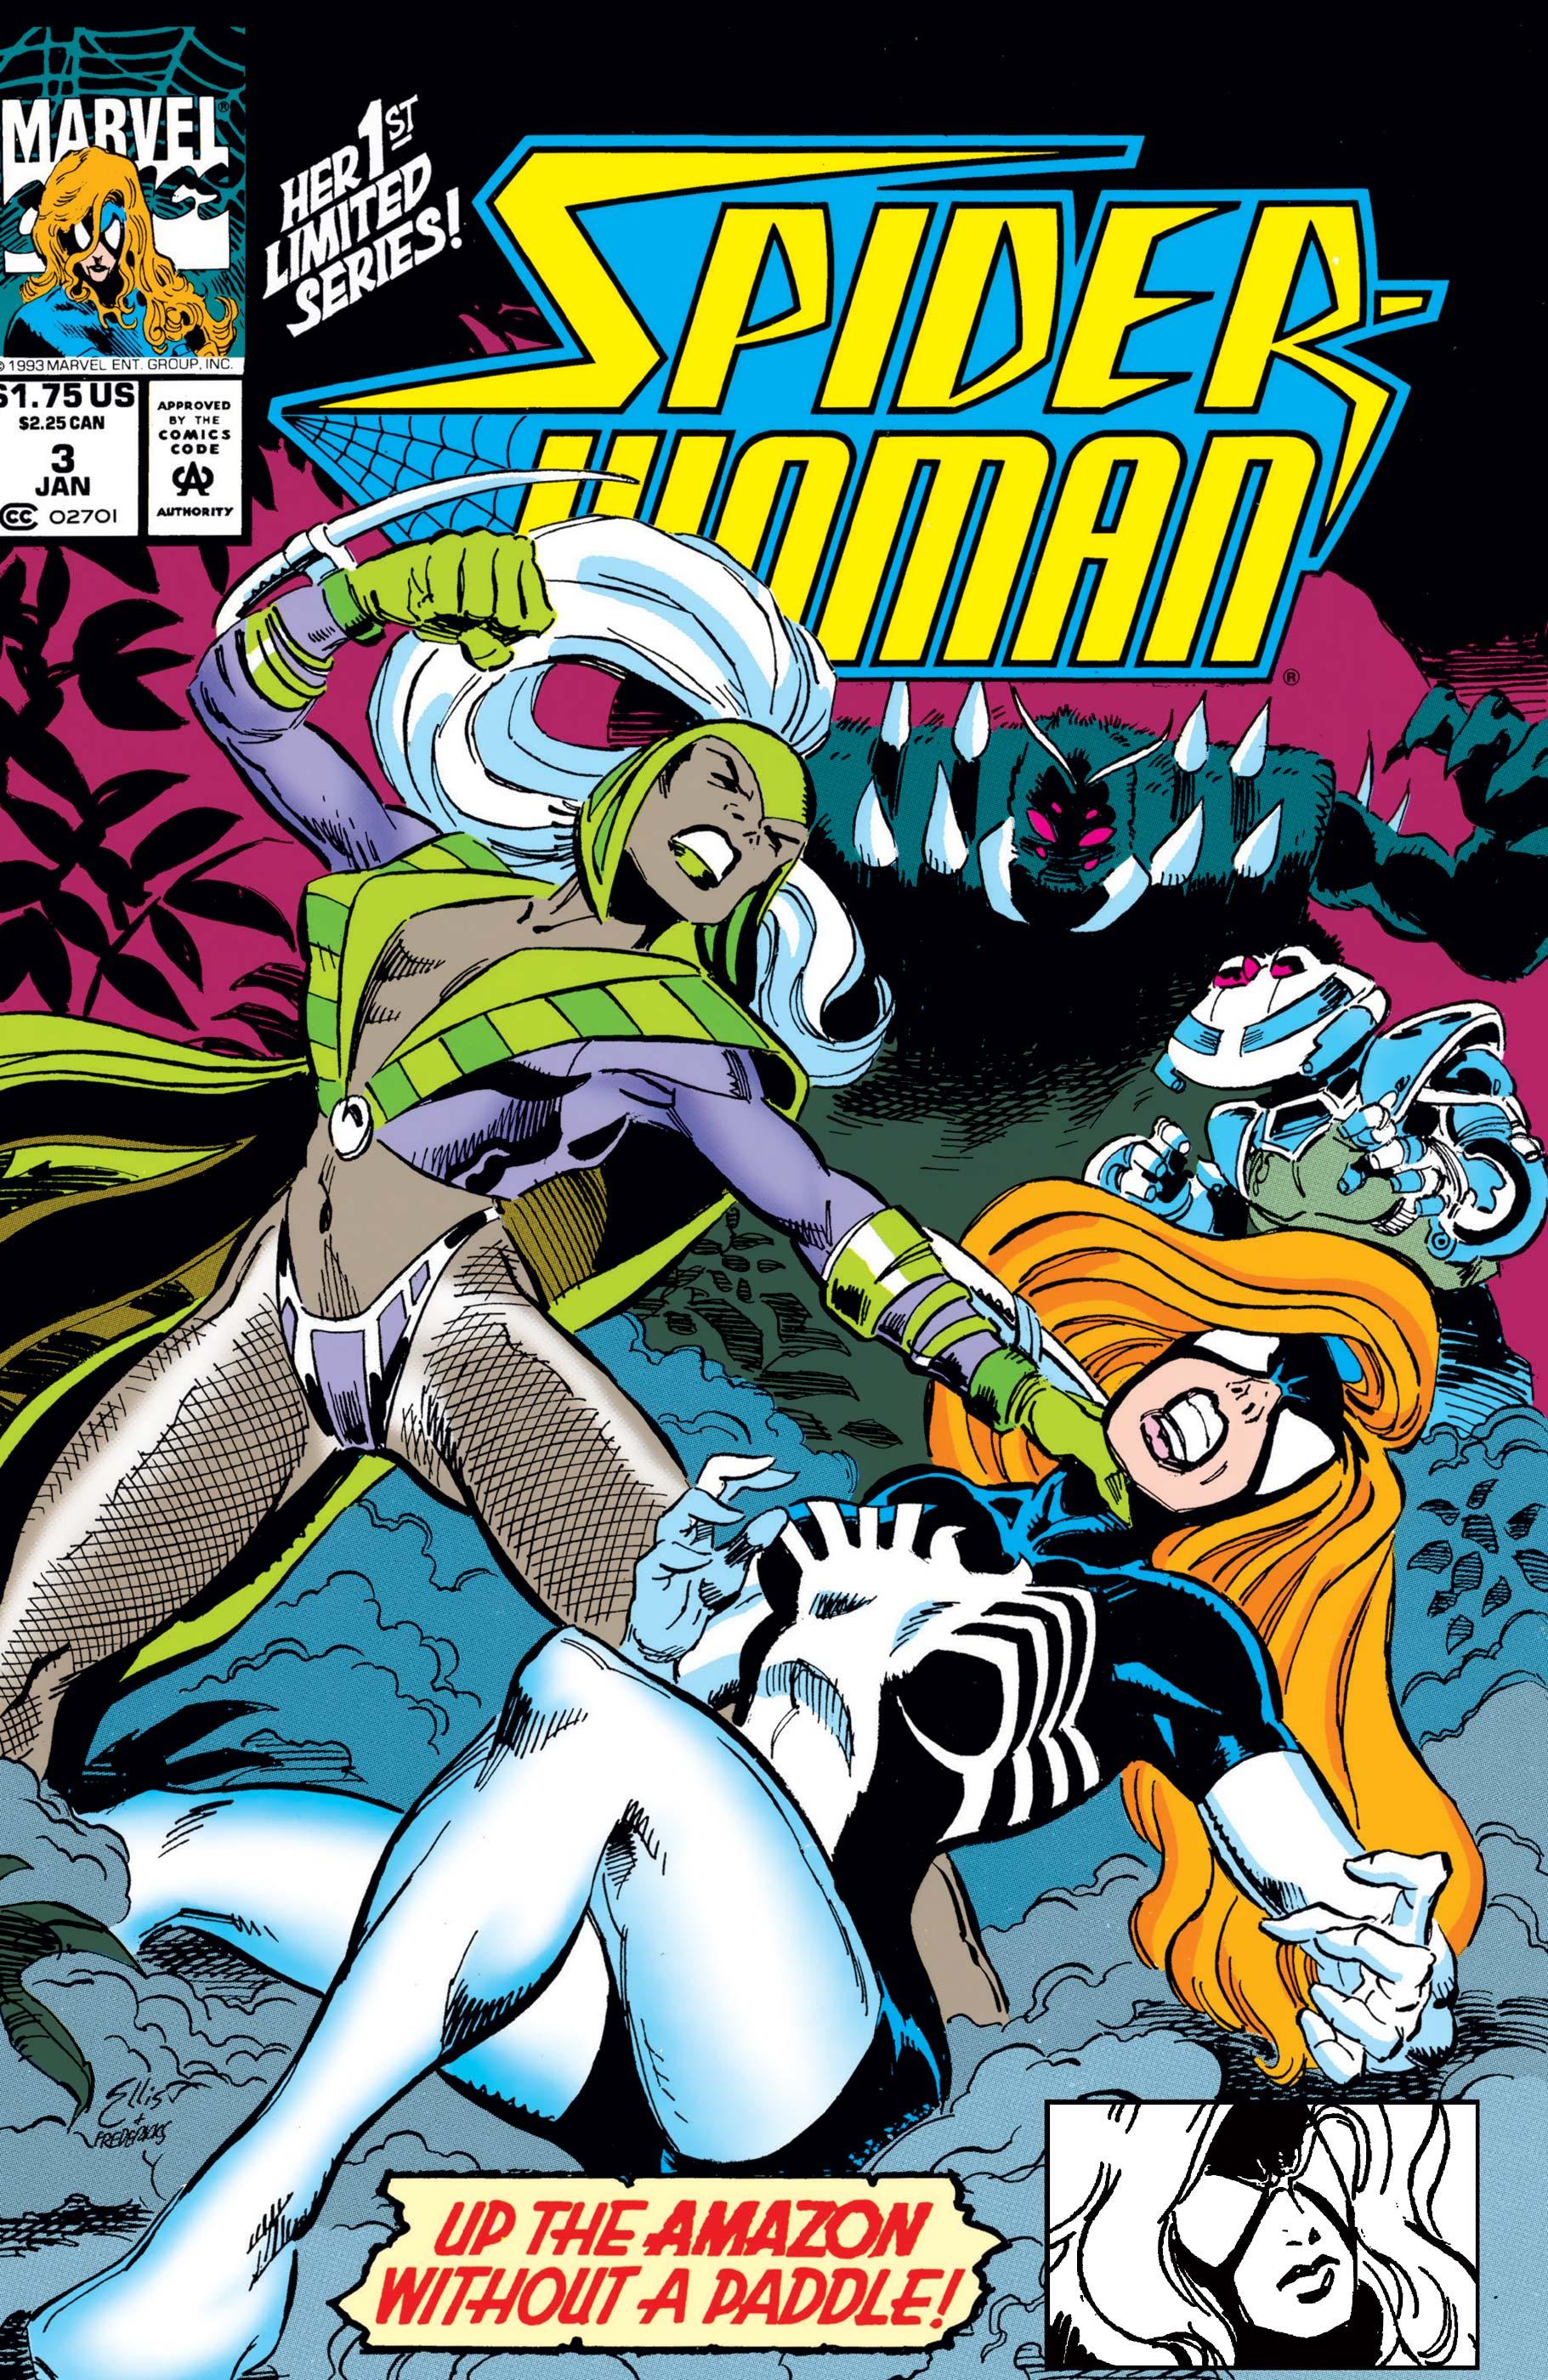 Spider-Woman (1993) #3